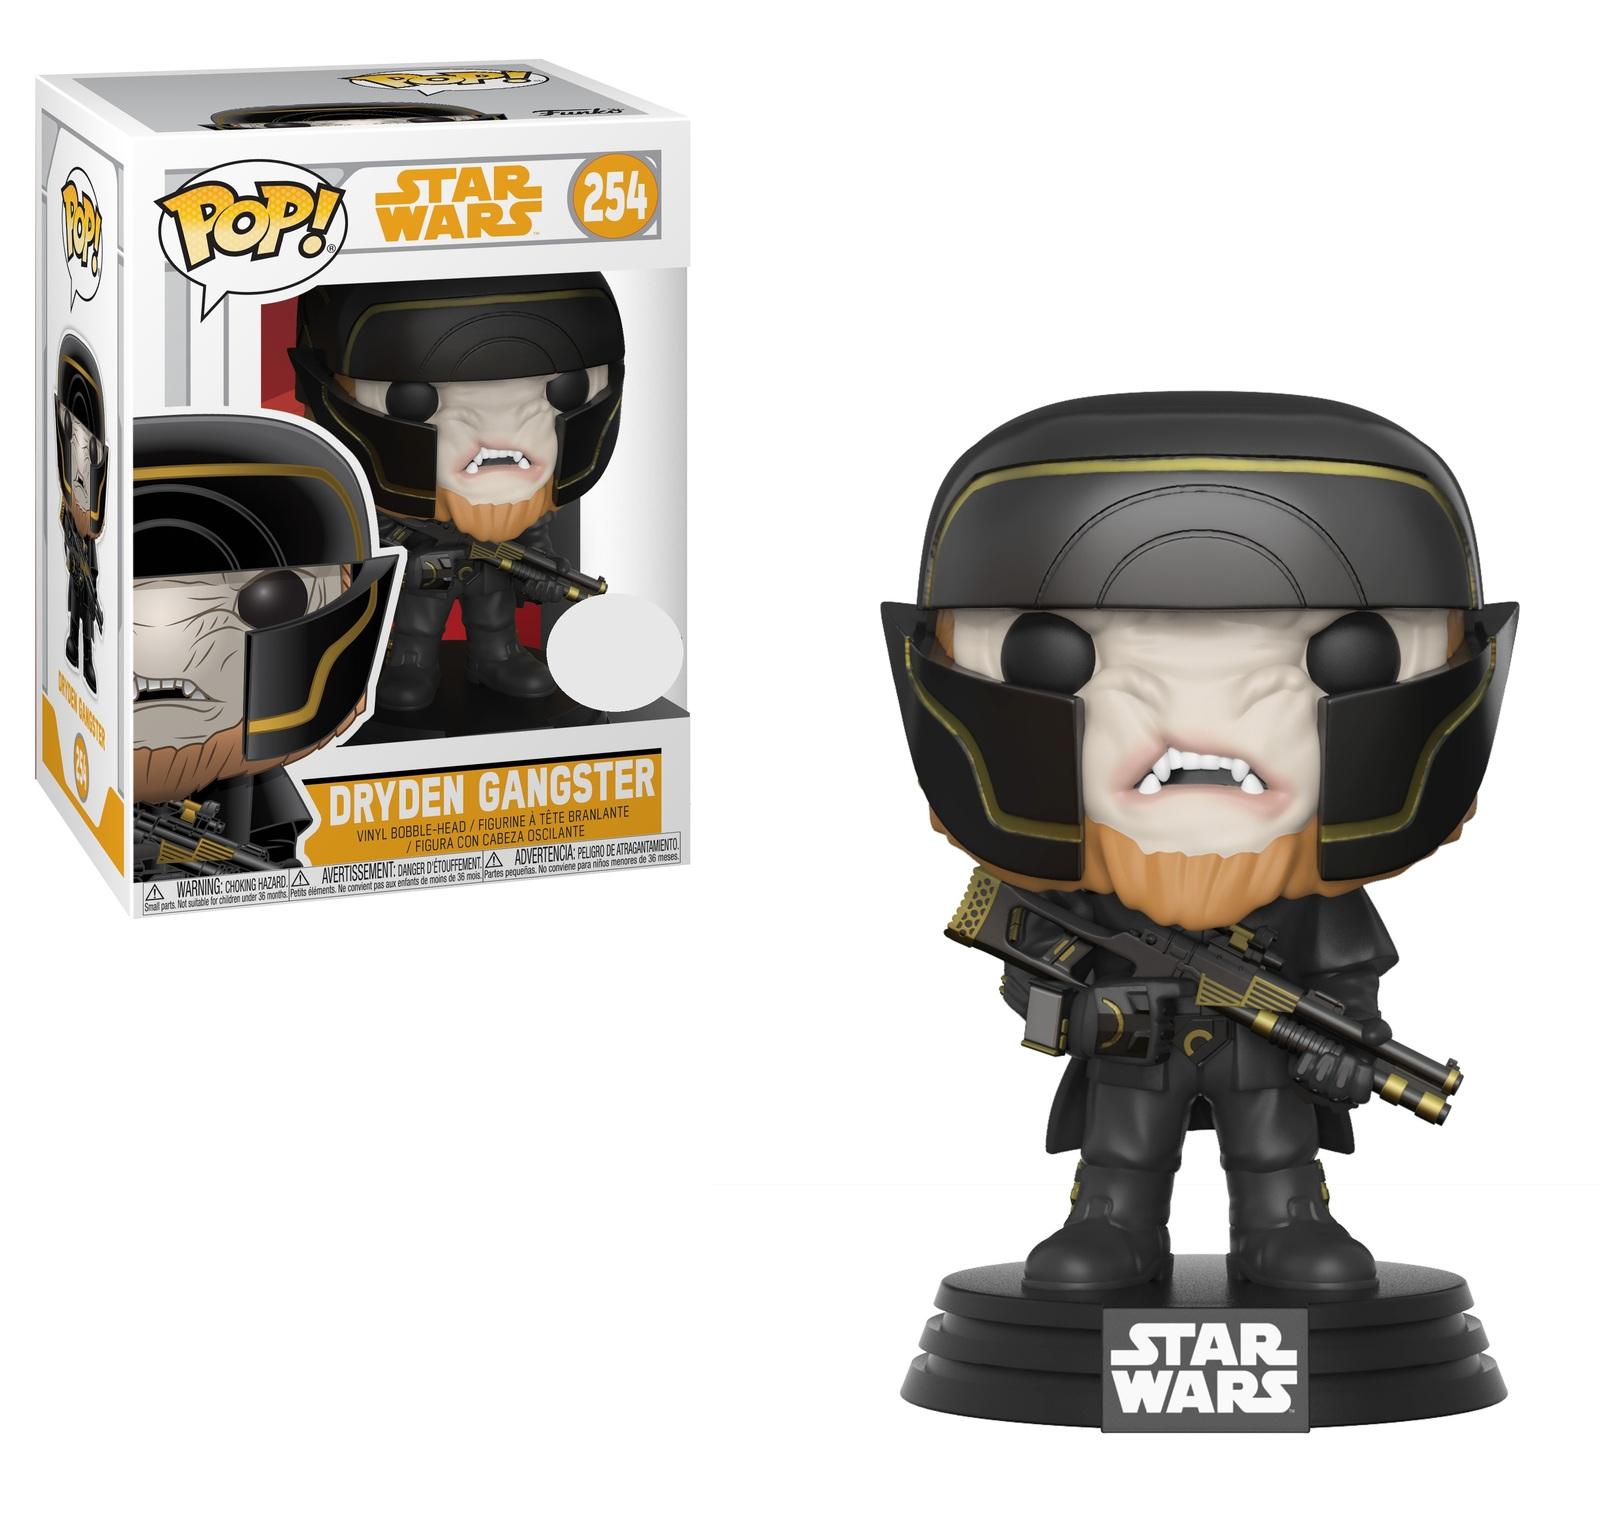 Star Wars: Solo - Dryden Gangster Pop! Vinyl Figure image